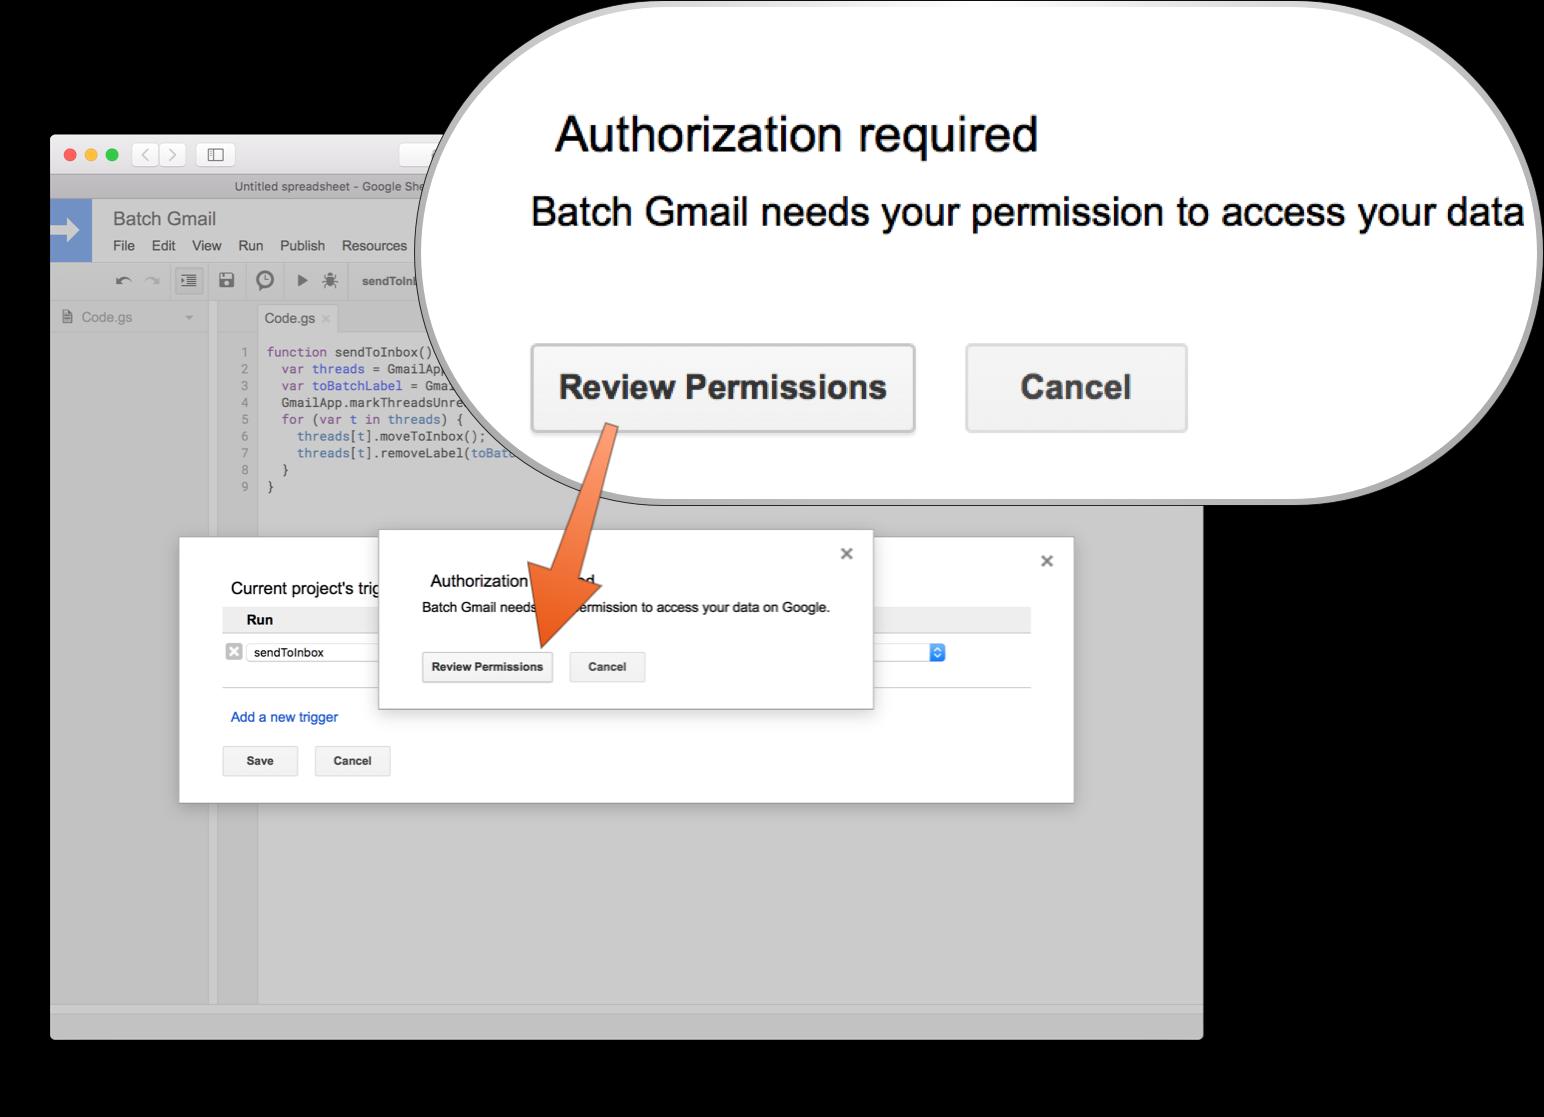 KF: Batch Gmail